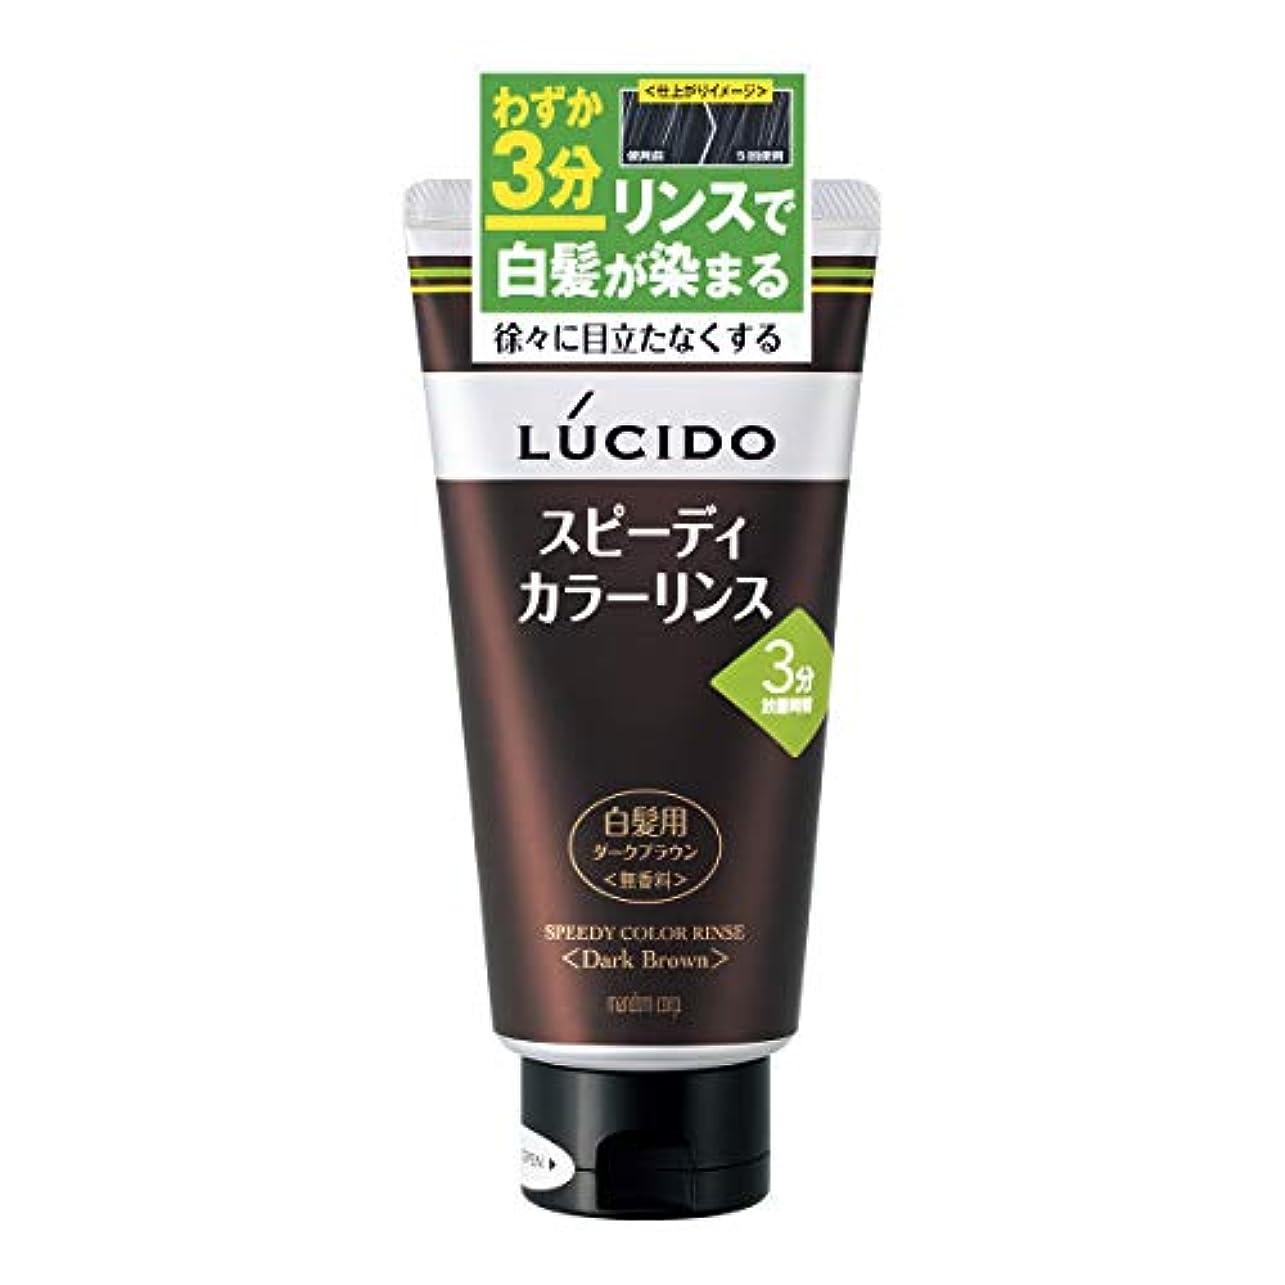 LUCIDO(ルシード) スピーディカラーリンス ダークブラウン 160g リンスで簡単白髪染め